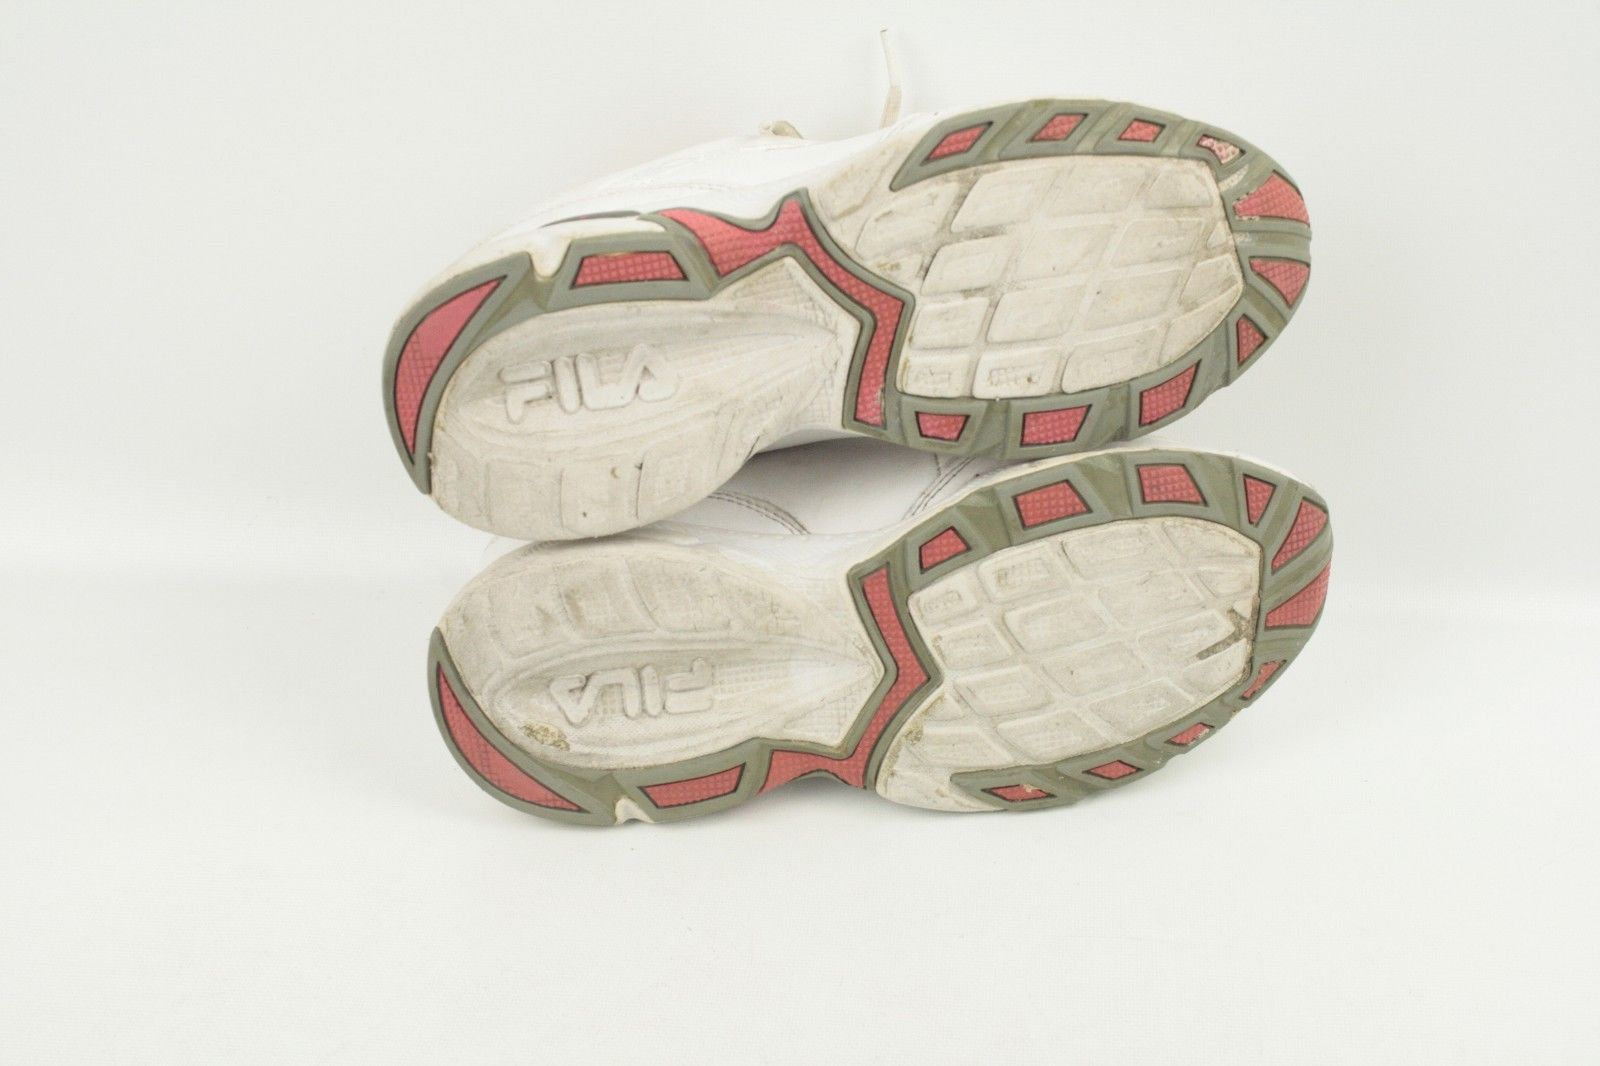 7693a1074c49 FILA-Womens-Memory-Foam-Outreach-Athletic-Shoe and 50 similar items